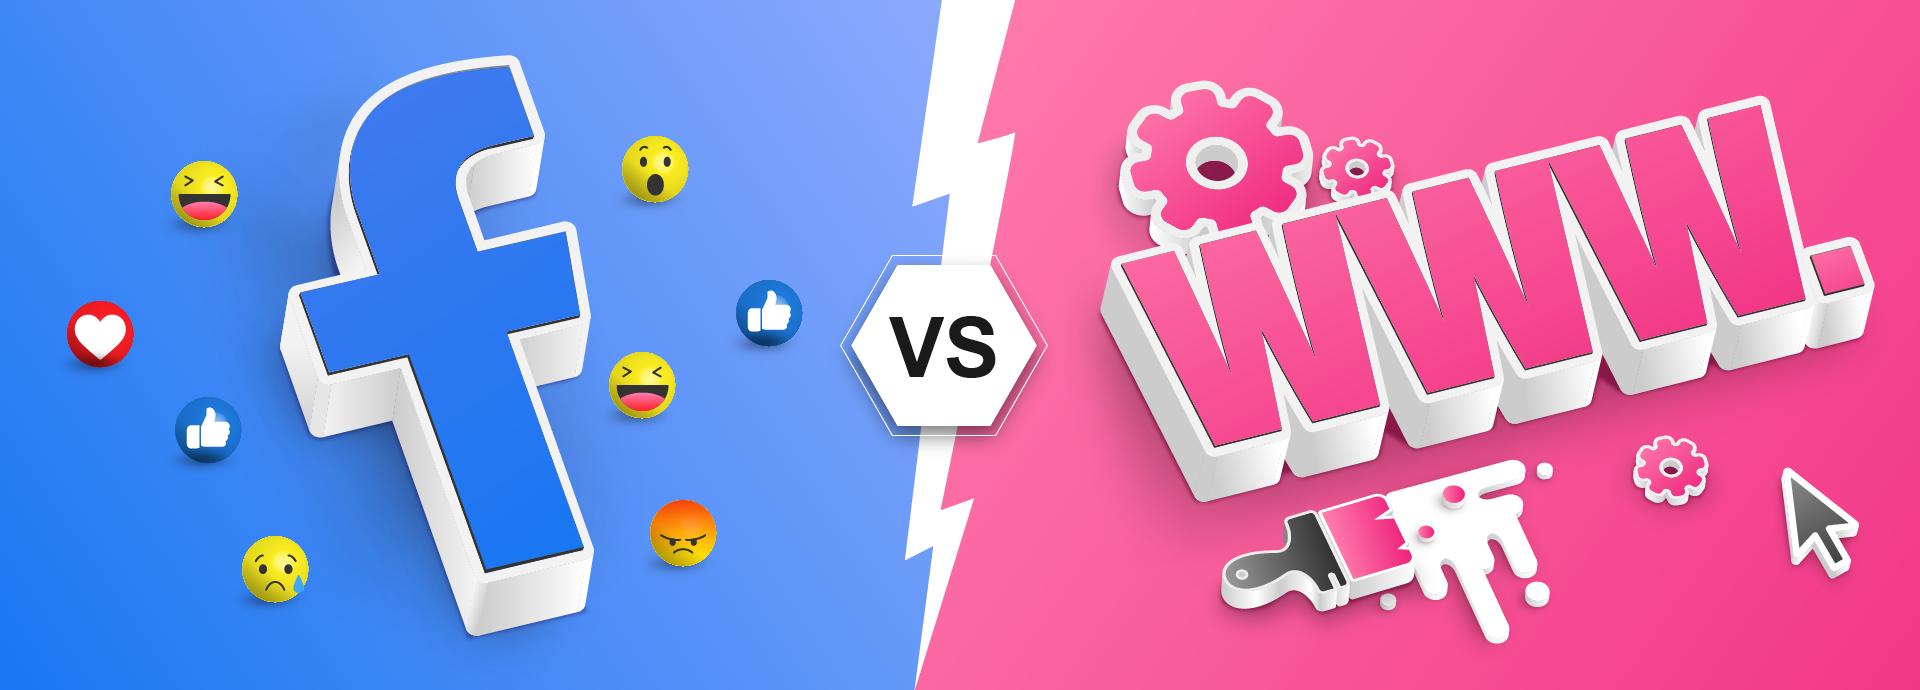 Websites v. Facebook: Do you need a website these days?